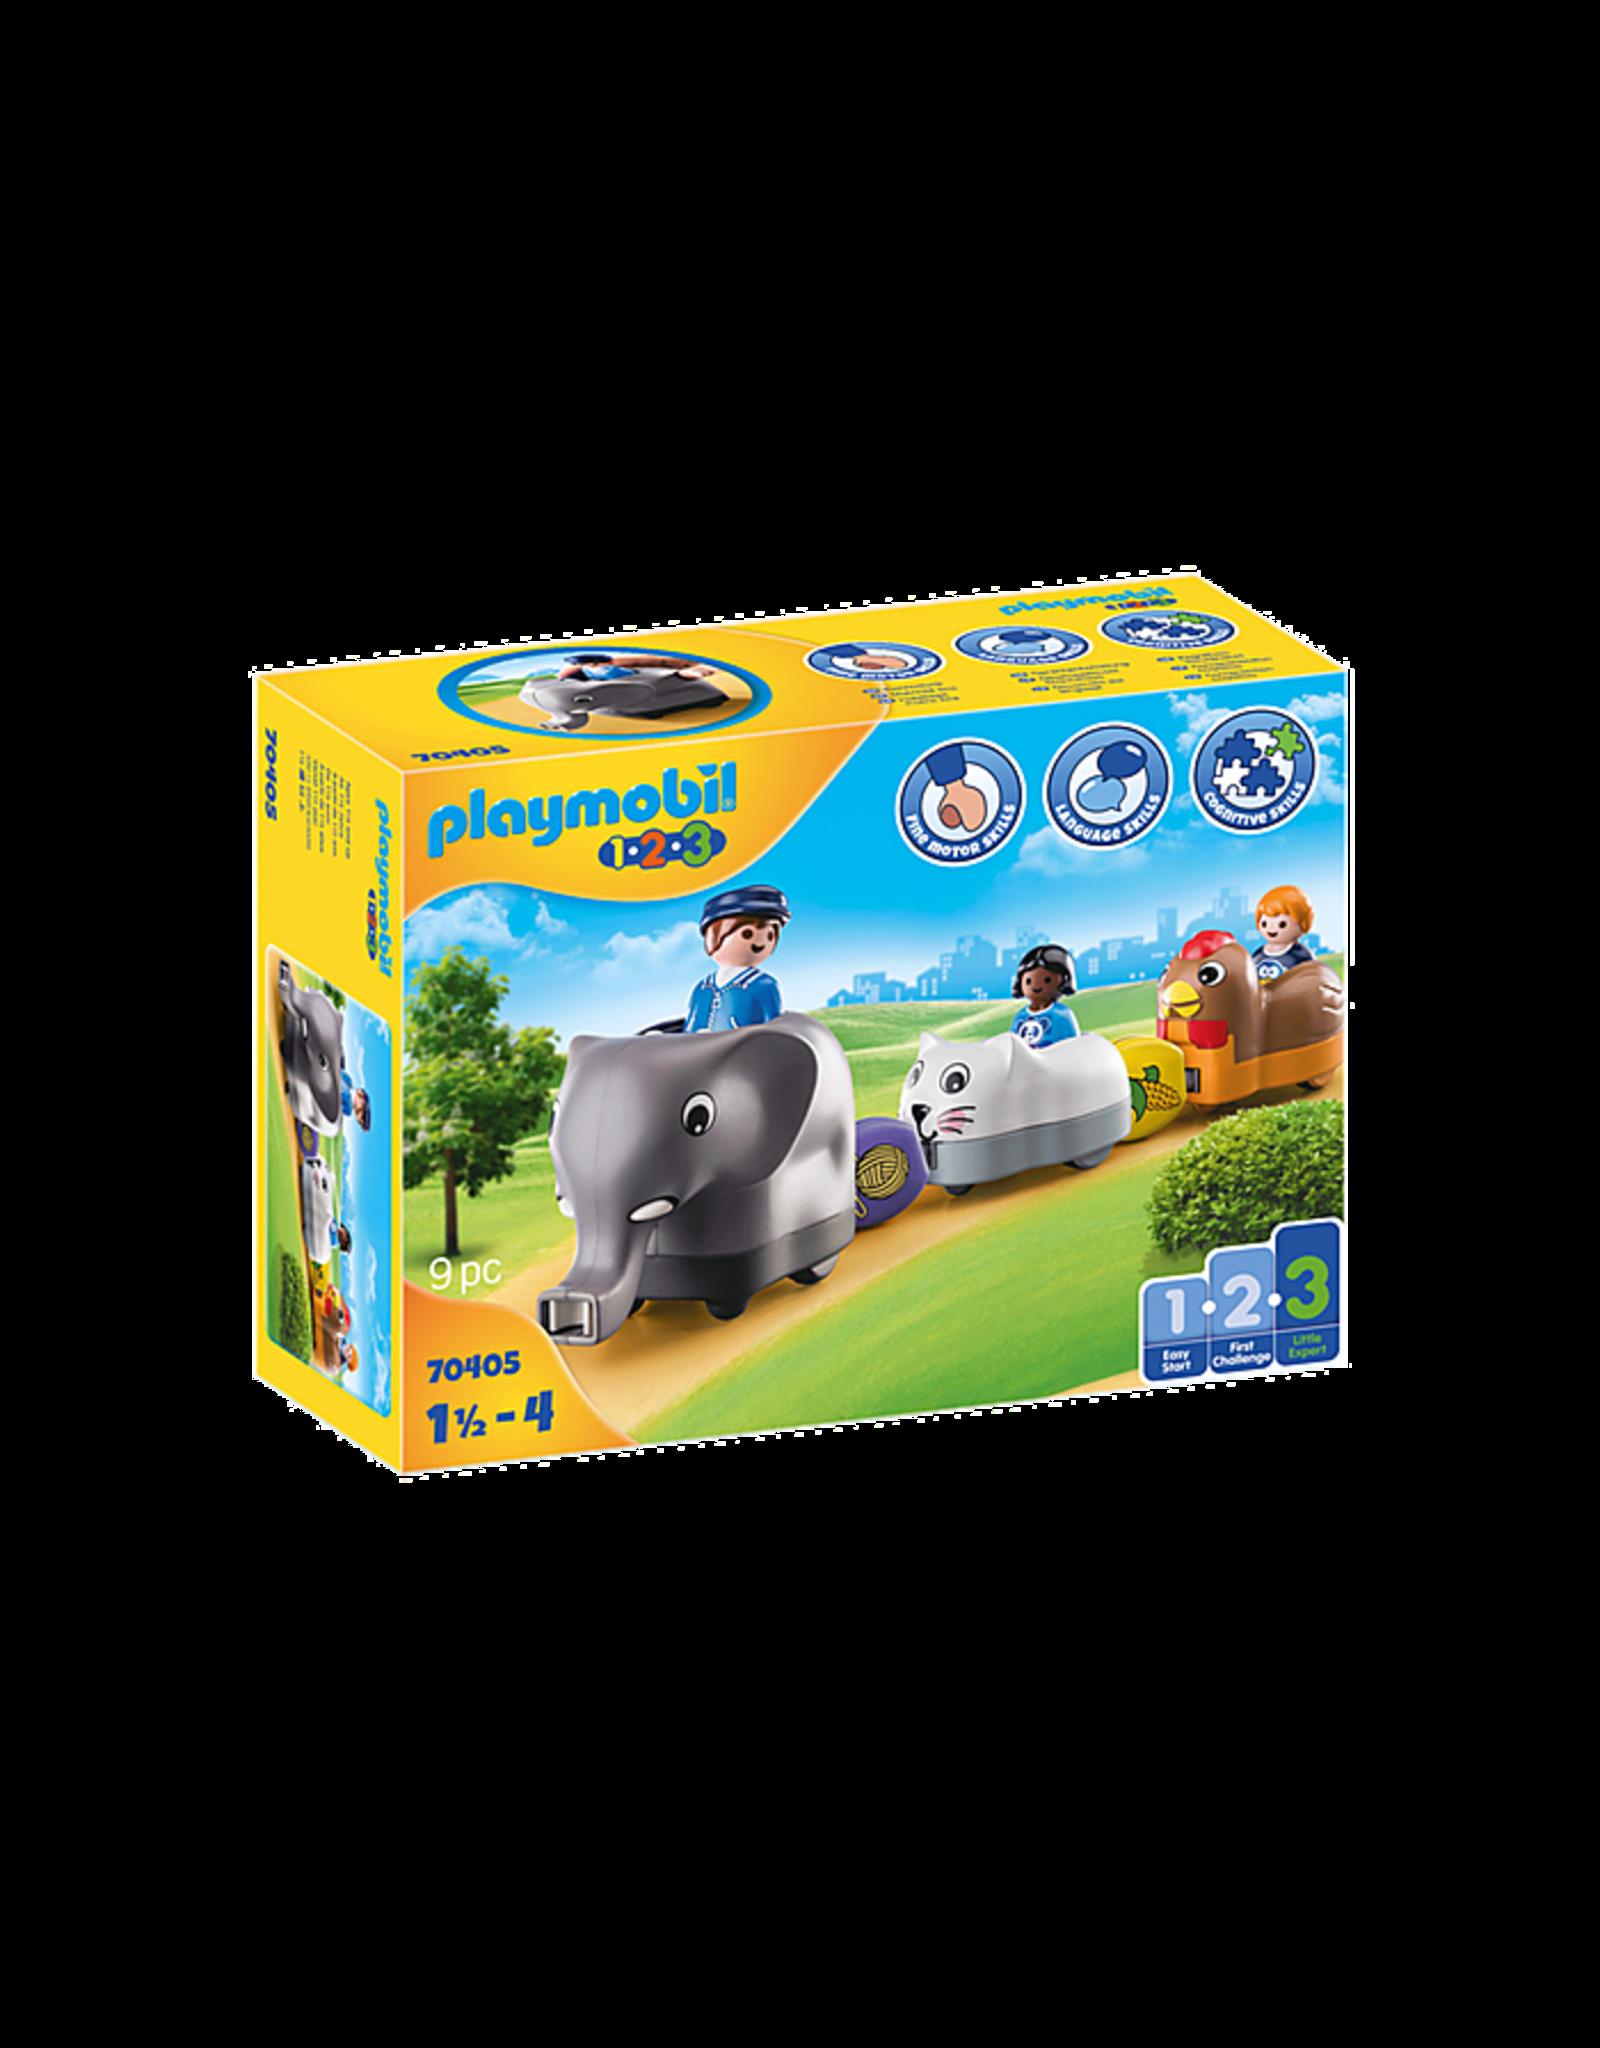 Playmobil Animal Train